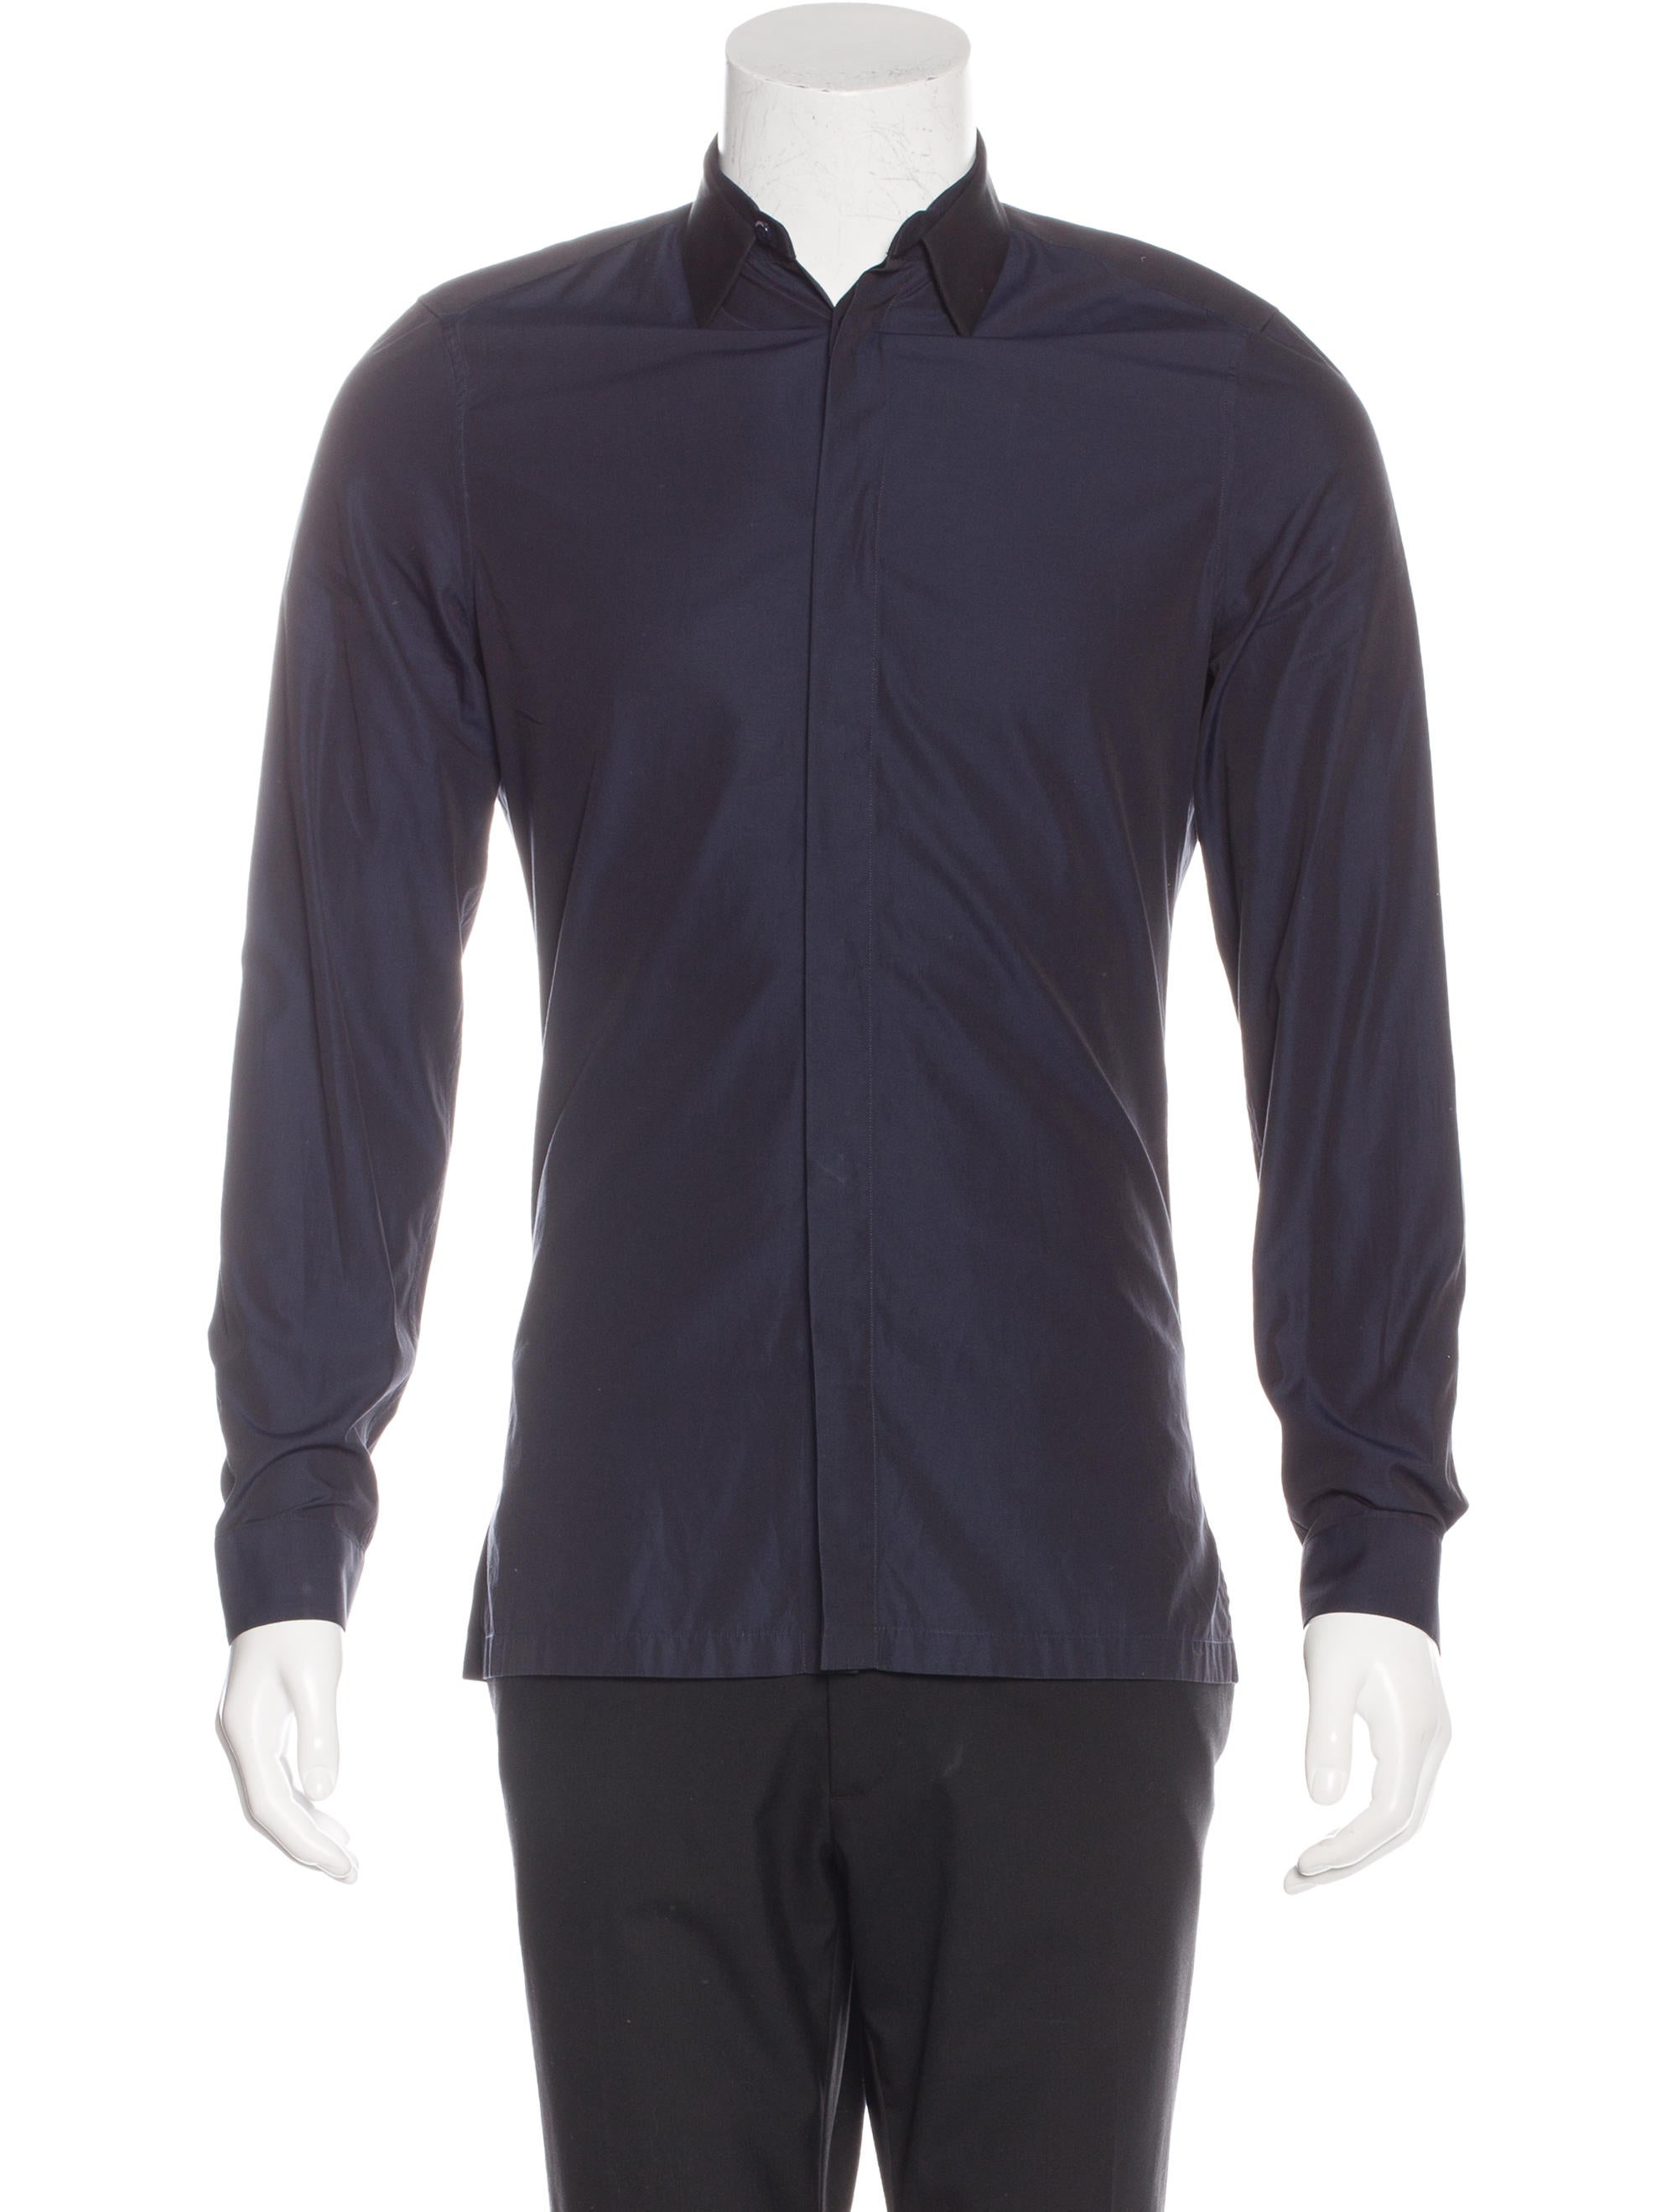 Balenciaga Tapered Collar Dress Shirt Clothing Bal46843 The